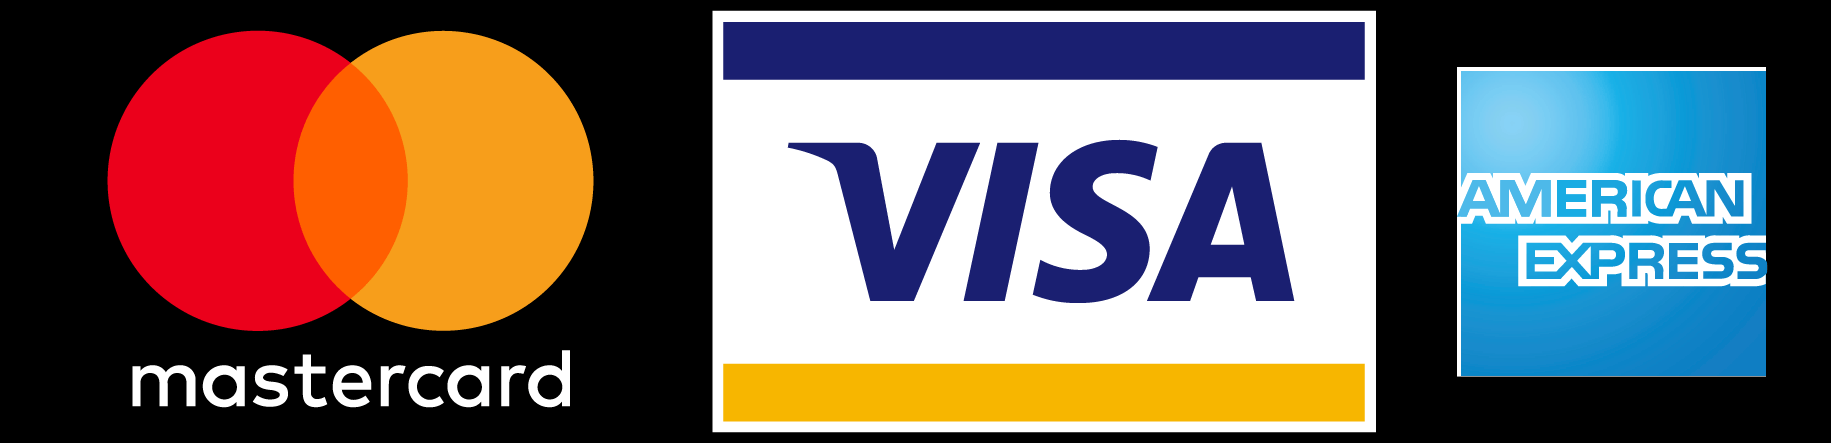 mastercard-logo-visa-american-express